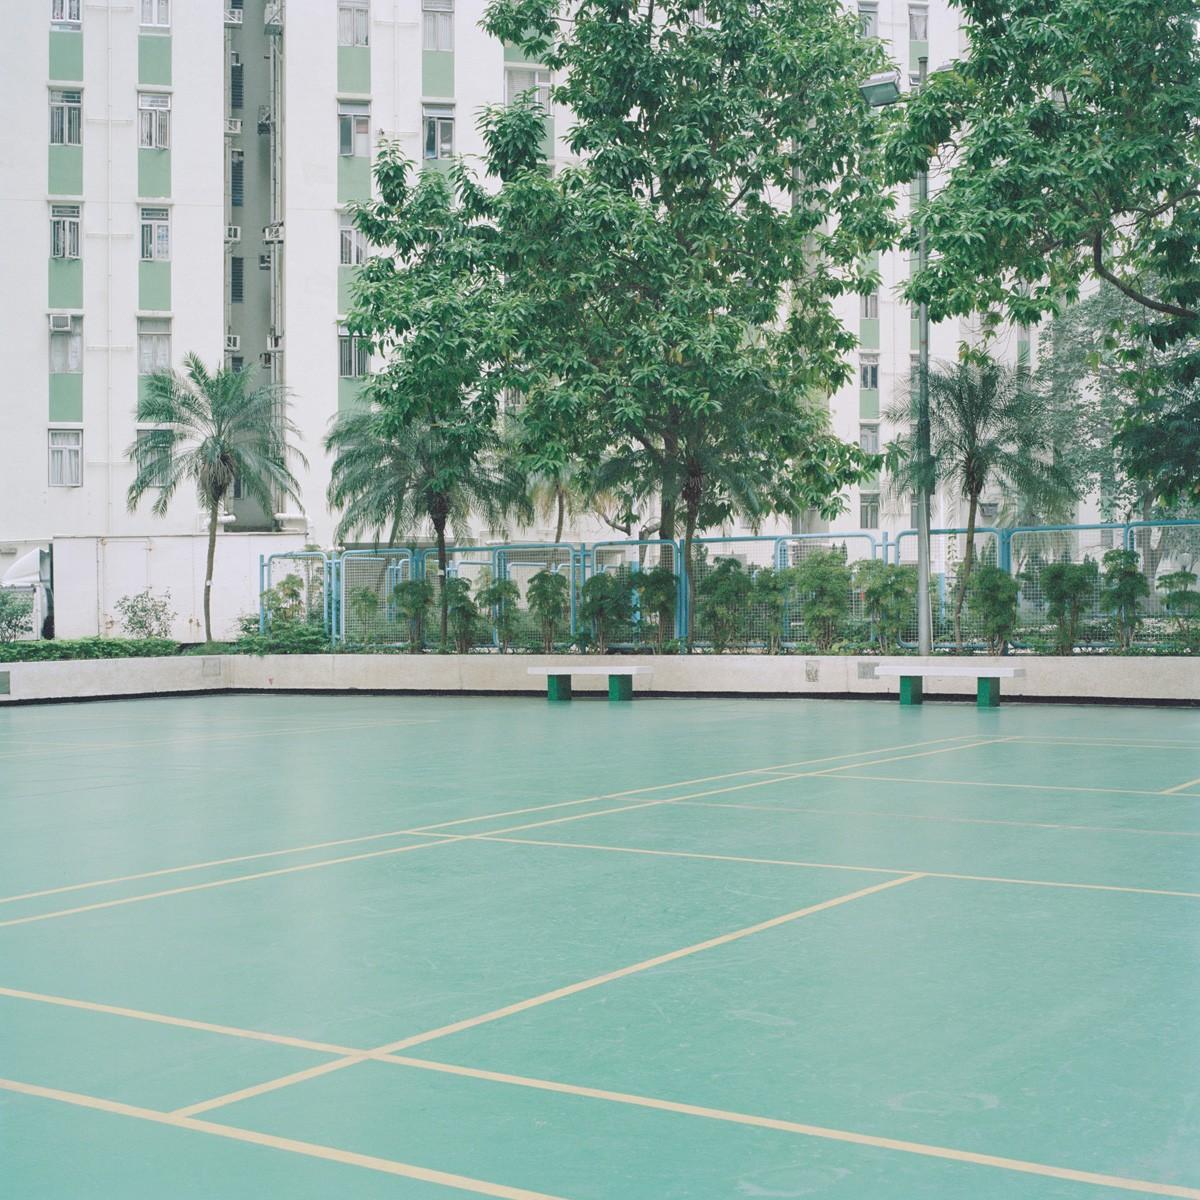 ward-roberts-courts-02.5-3b9bf2102ea3ef708a7561dca4dbae0f